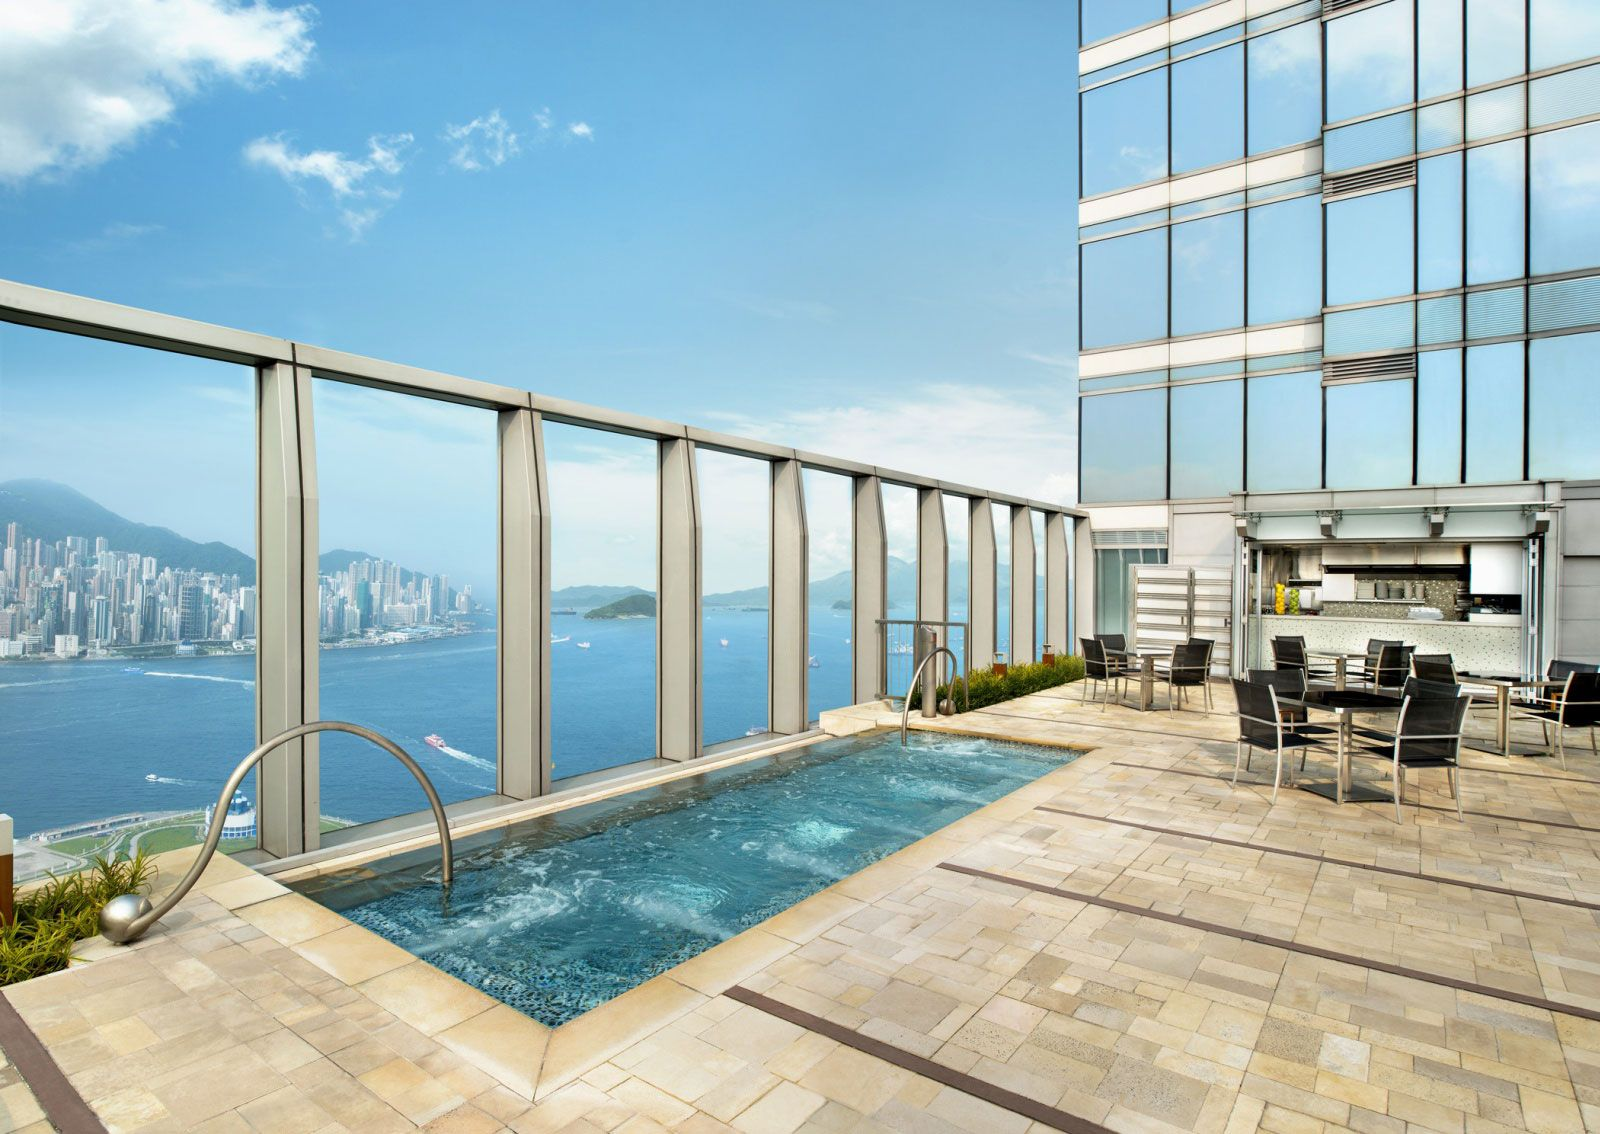 Luxurious w hong kong hotel caandesign architecture for Design hotel hong kong